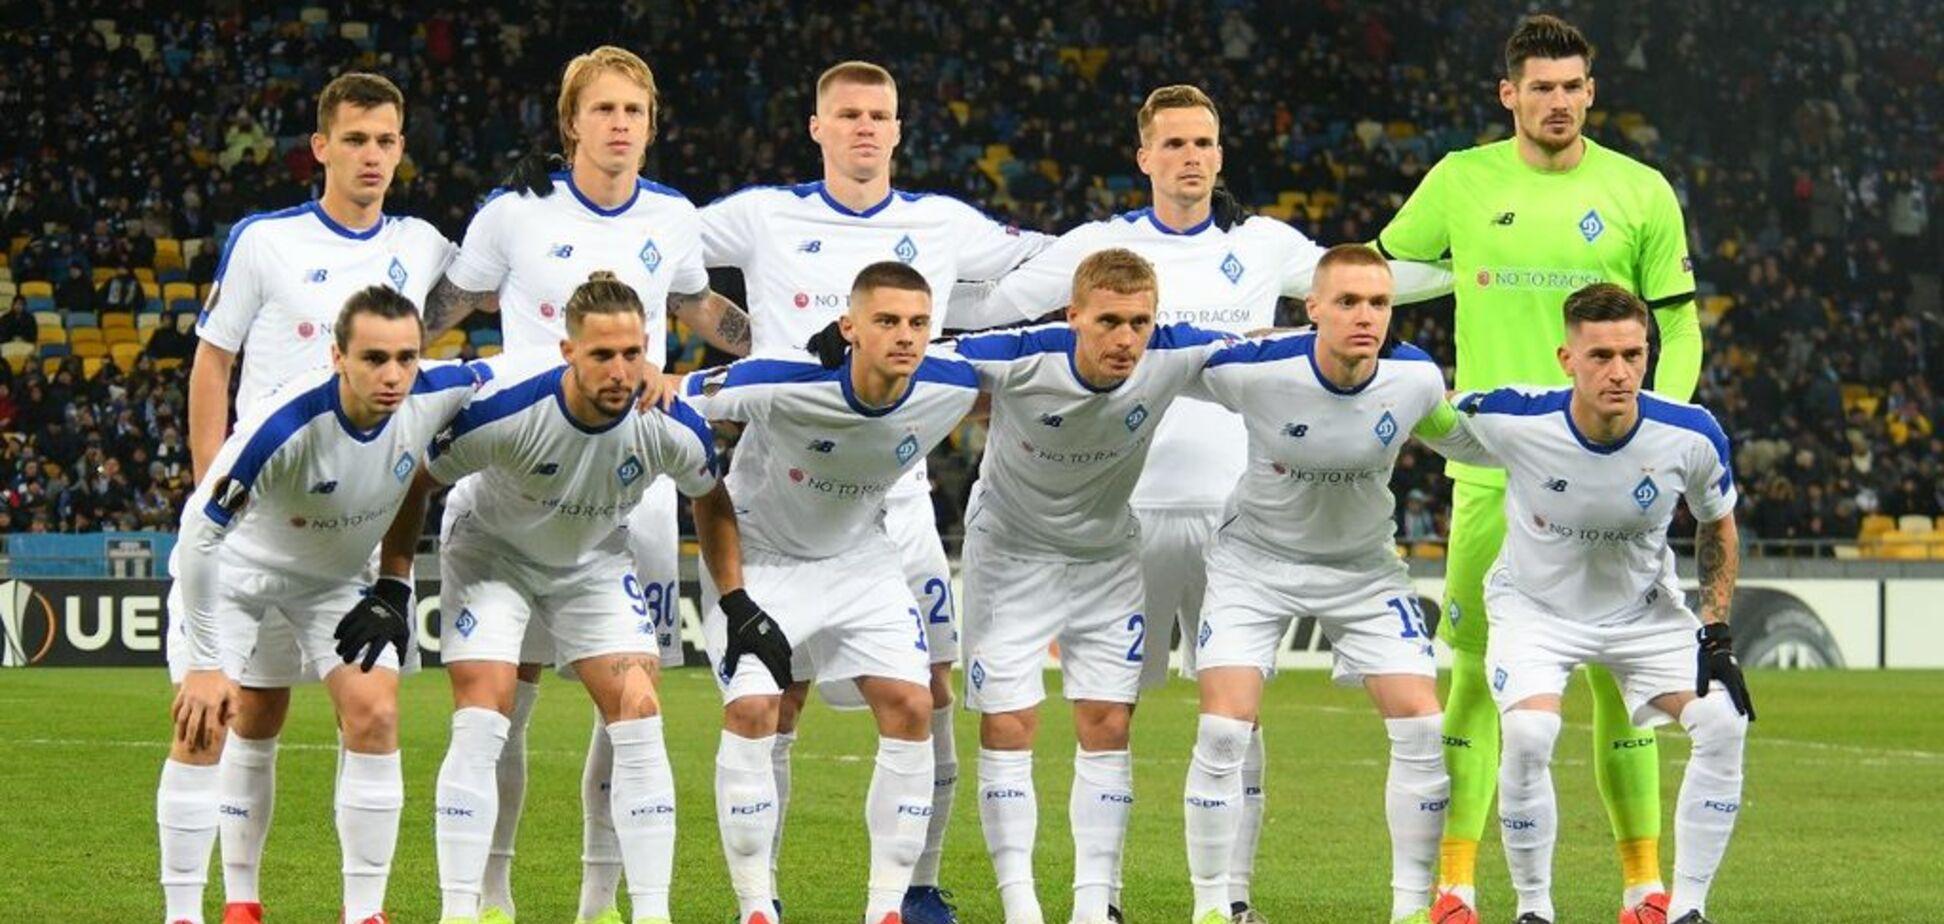 Футболист 'Динамо' вошел в команду тура ЛЕ по версии УЕФА